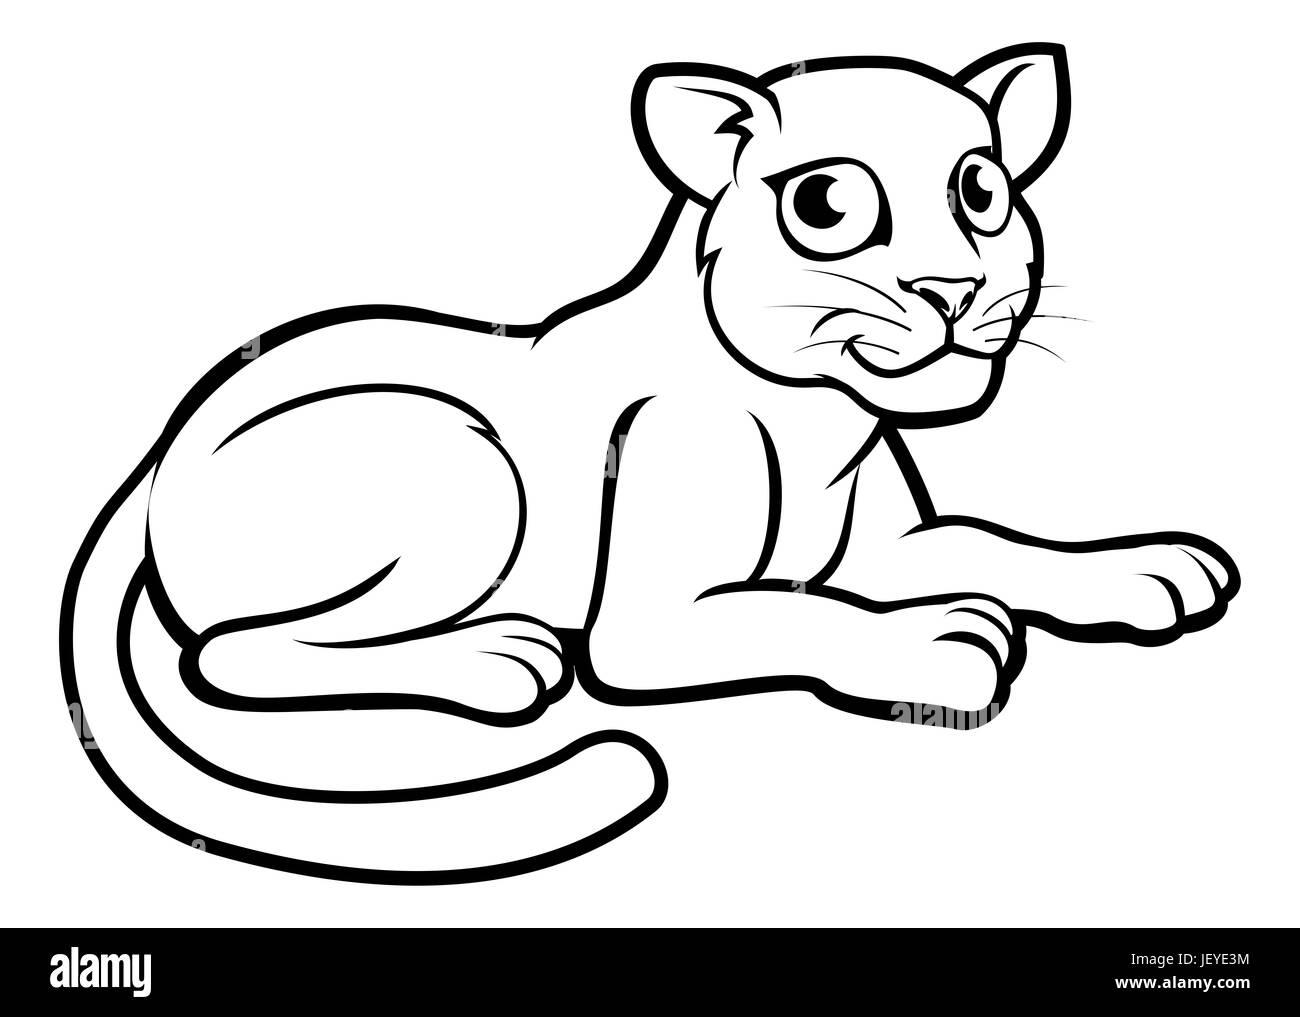 a leopard jaguar or panther cartoon character outline coloring illustration - Outline Cartoon Pictures